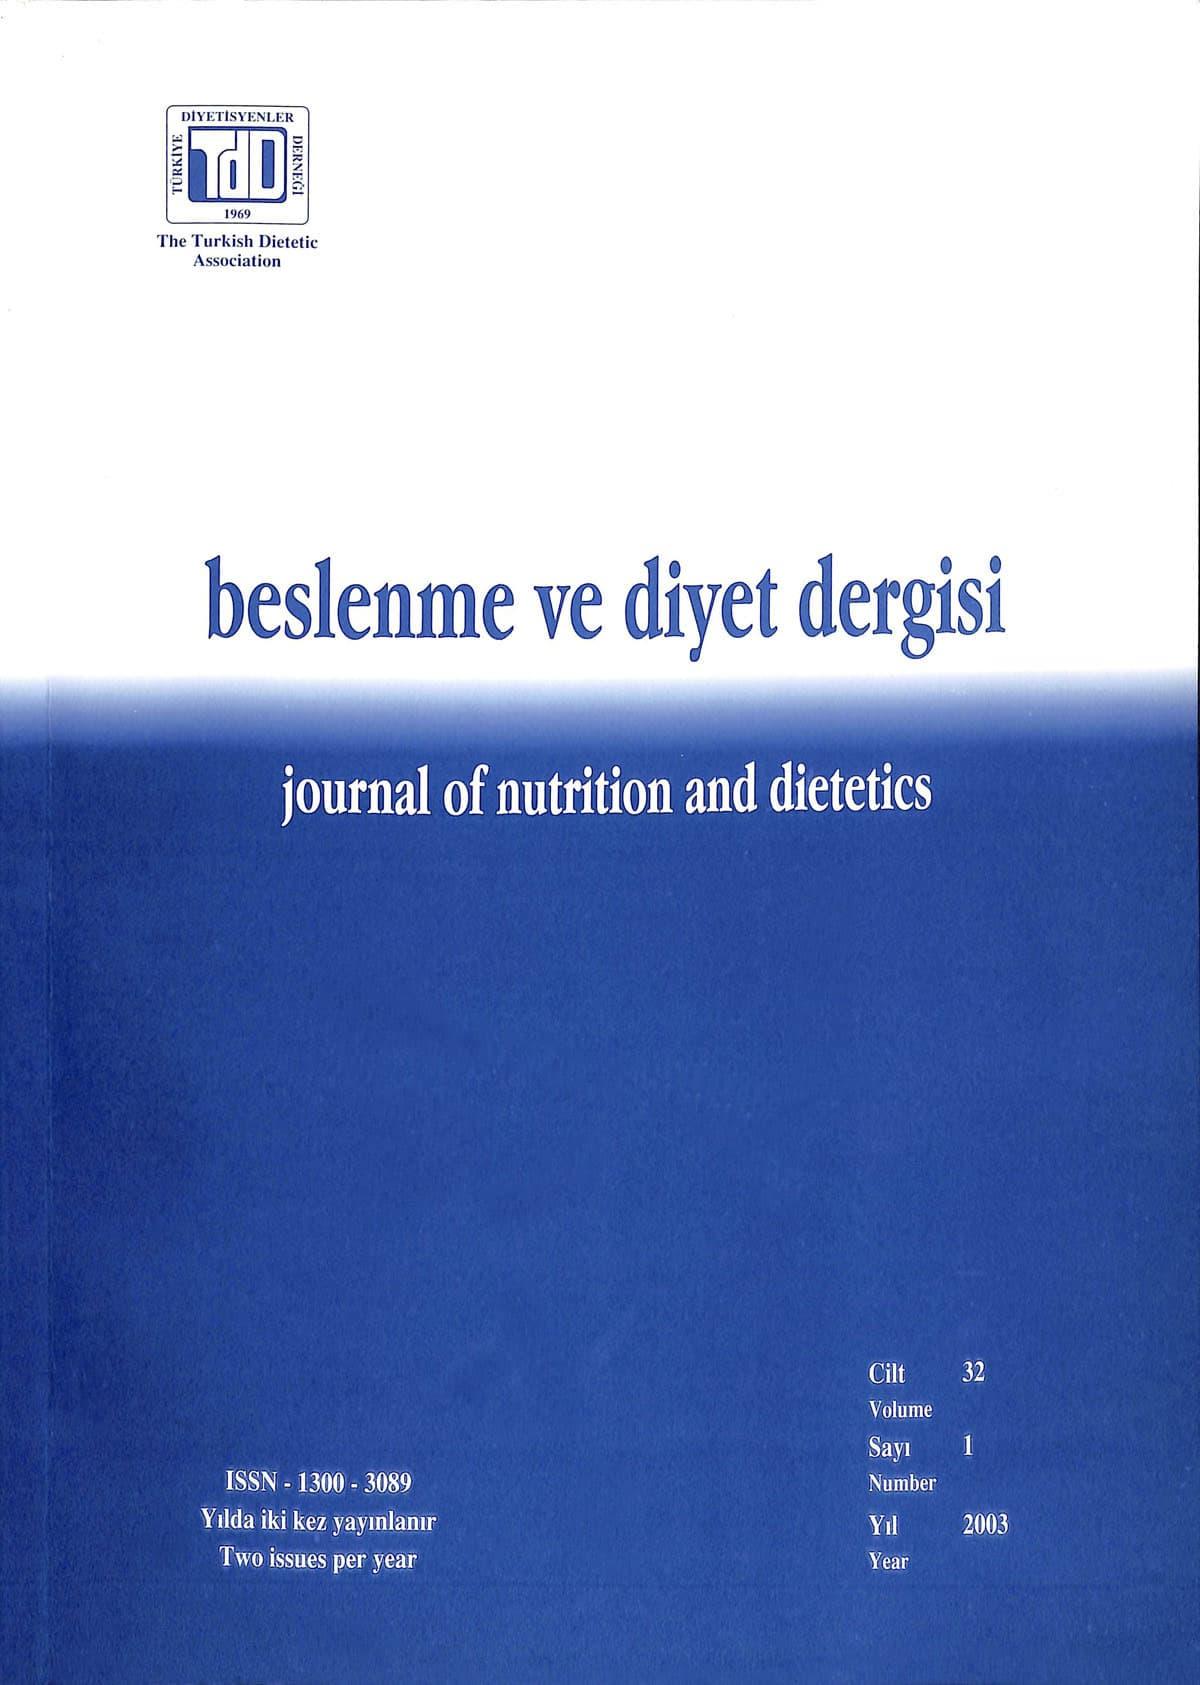 Cilt 32 Sayı 1 (2003)